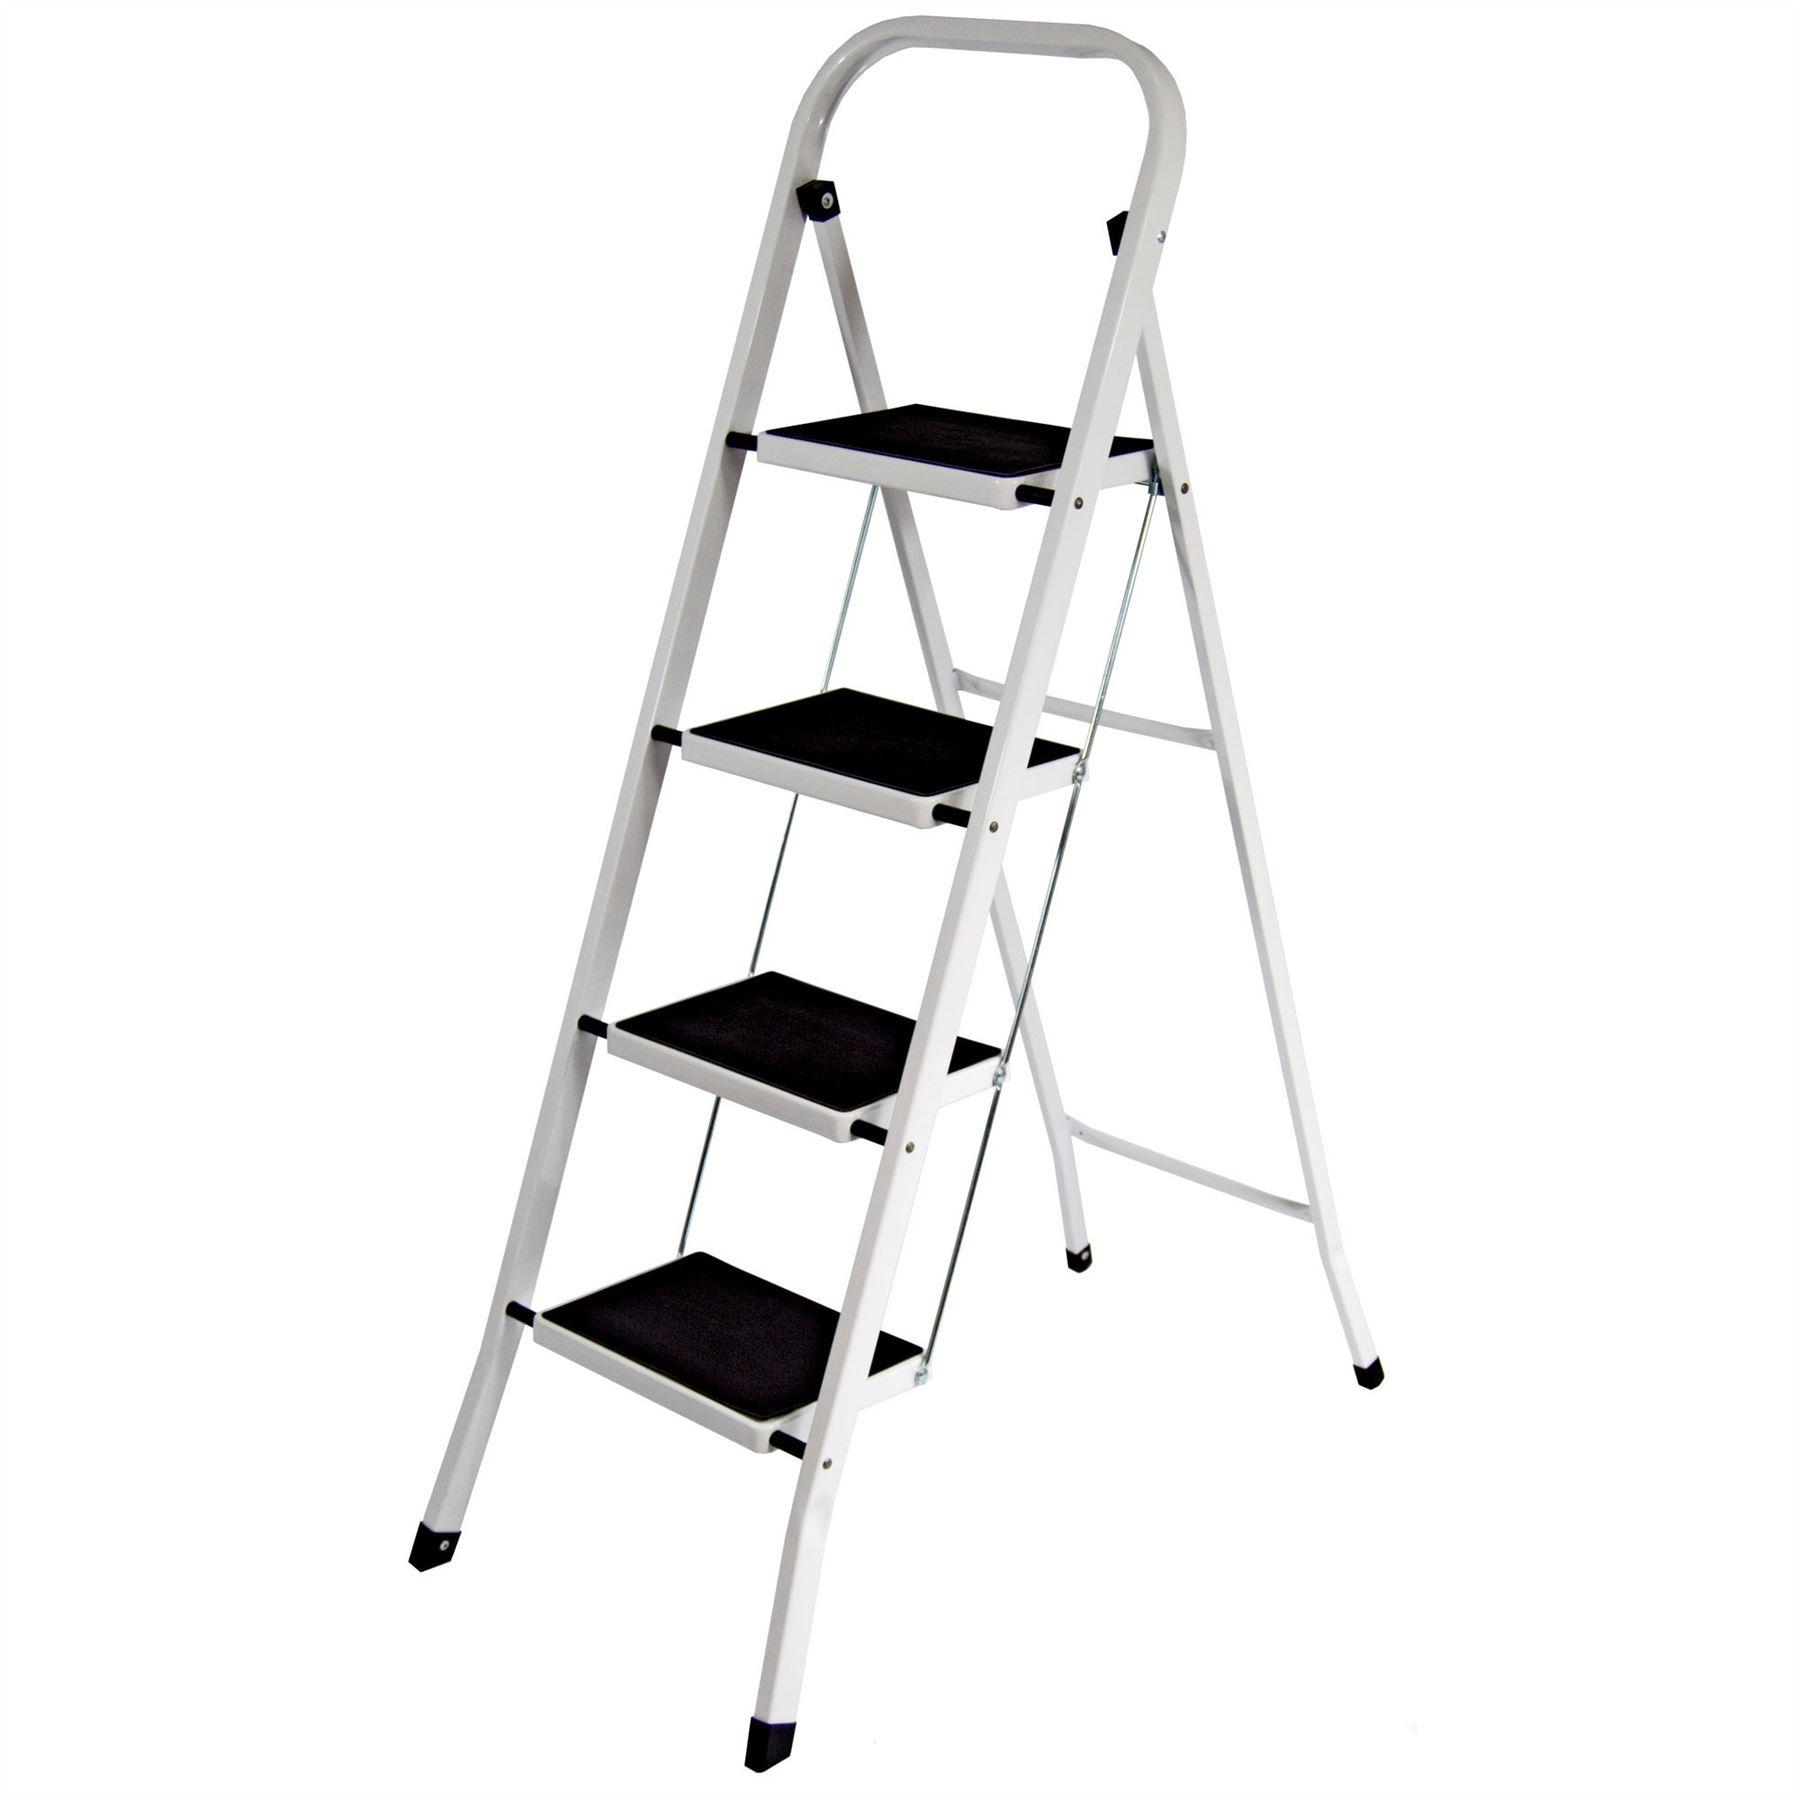 Diy Portable Handrails : Step ladder safety anti slip rubber mat tread handrail